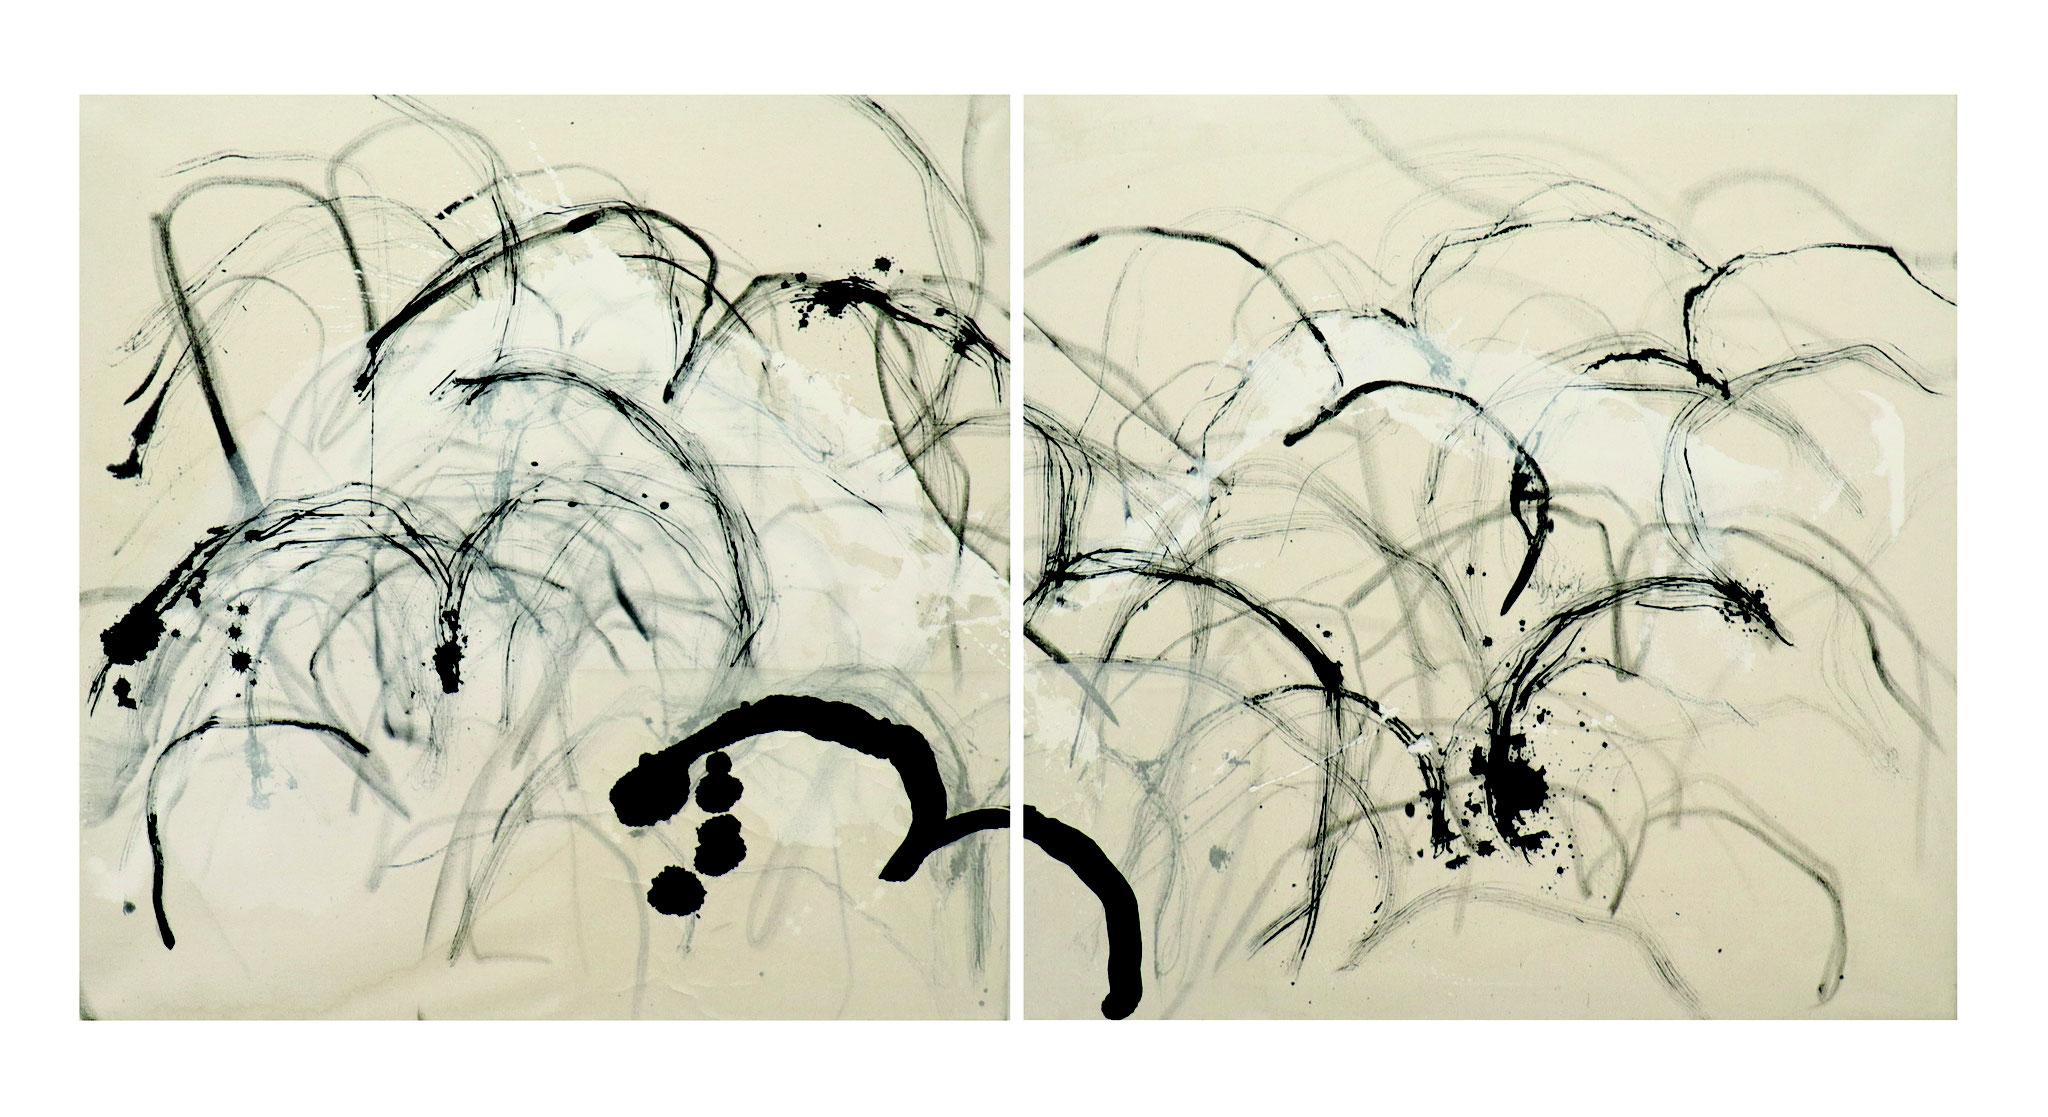 'fly bird fly' - Tusche auf Leinwand / ink on canvas - 180 x 90 cm